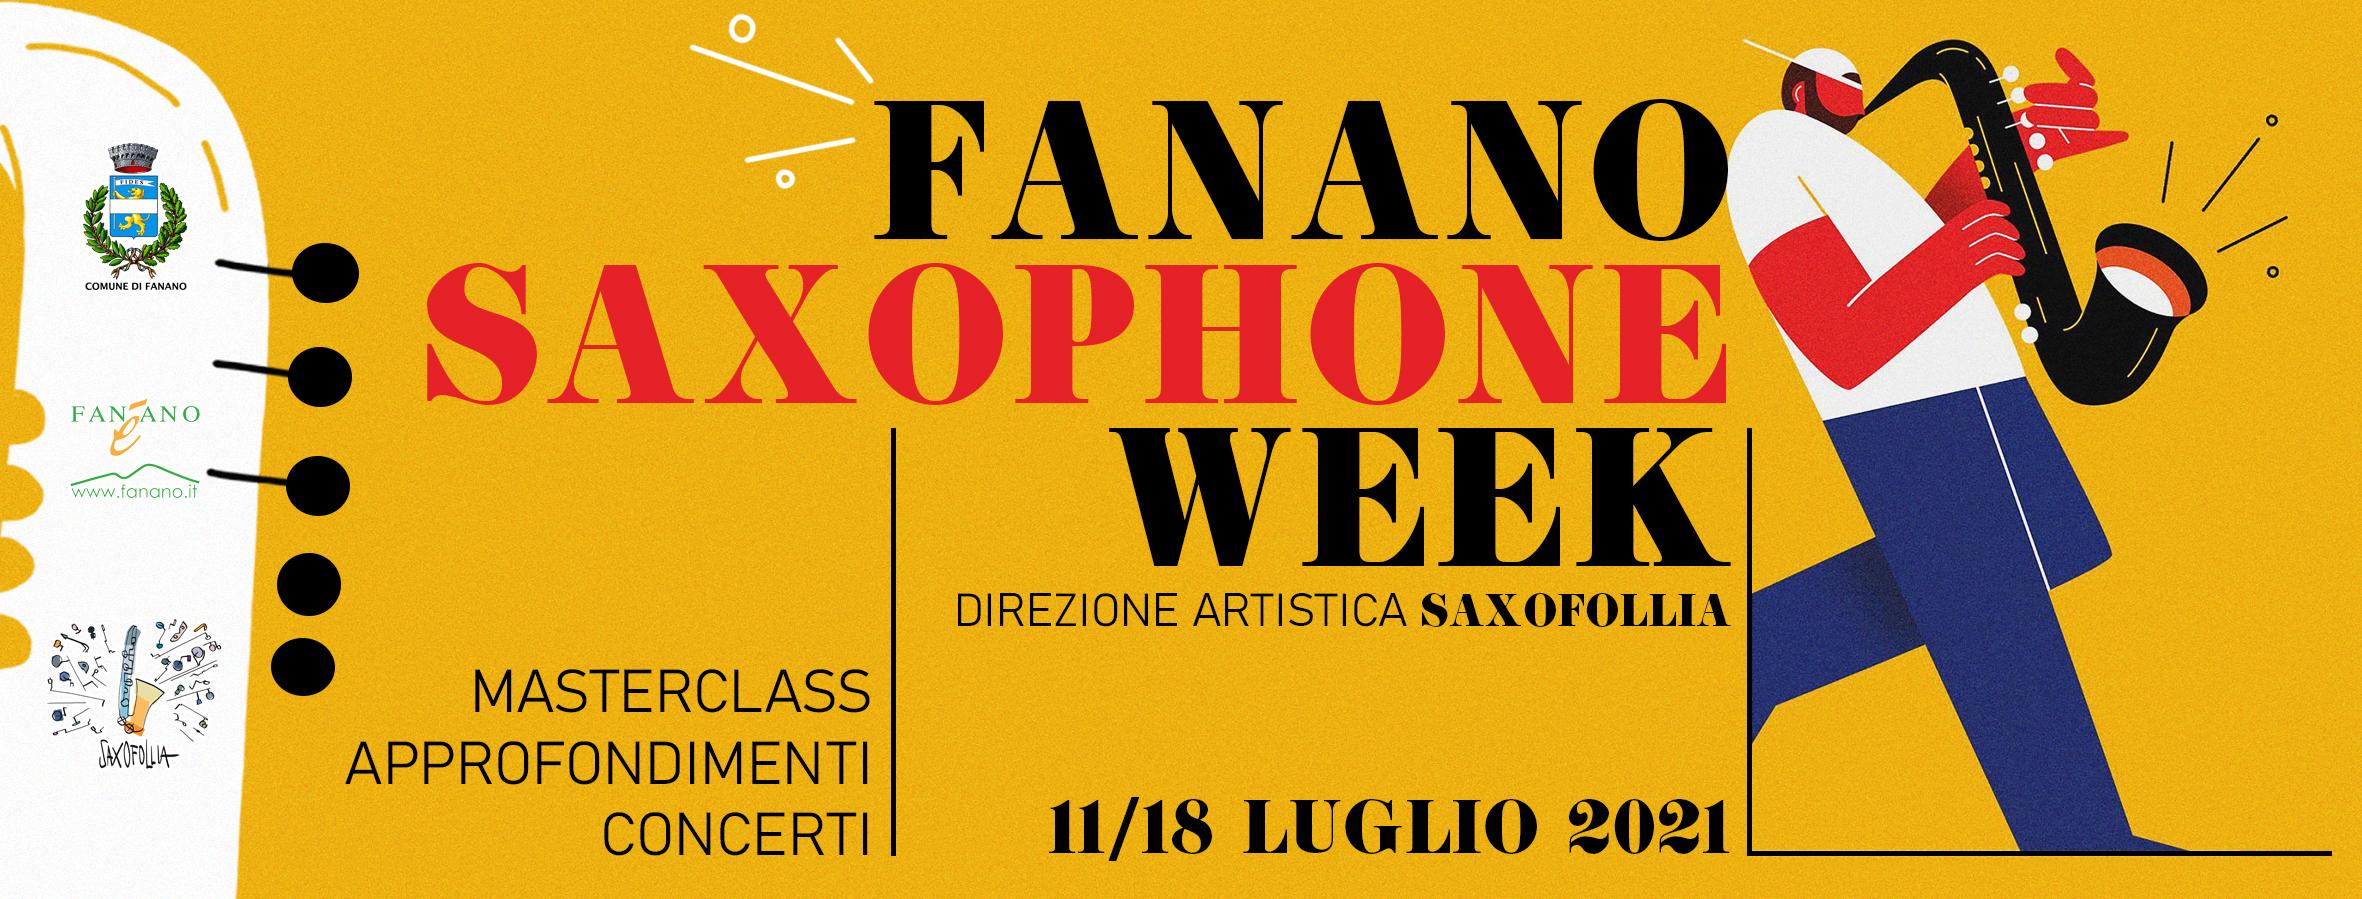 Fanano Saxophone Week